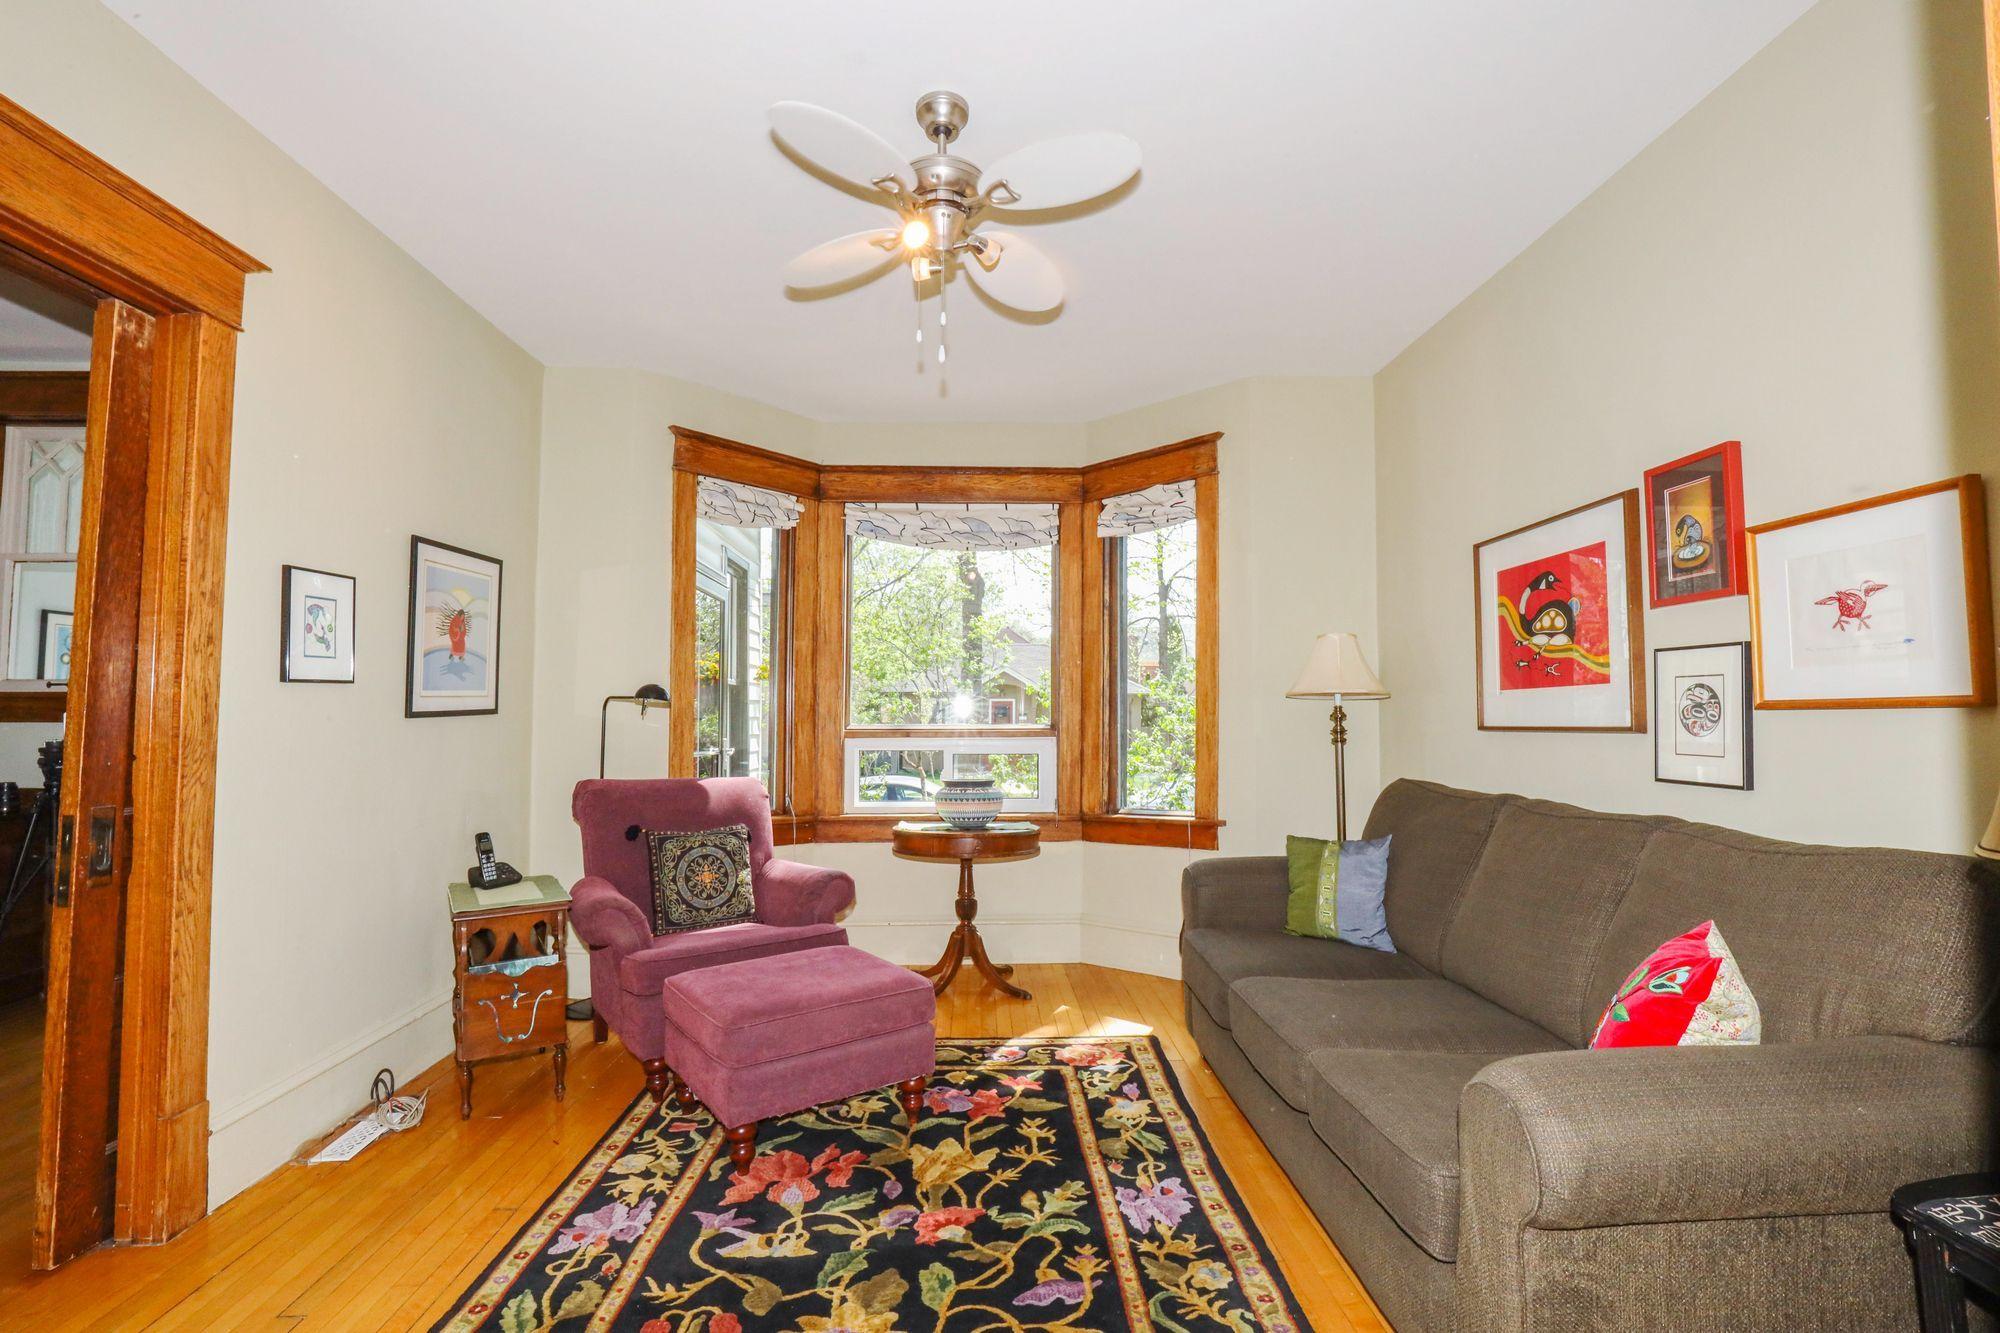 Photo 8: Photos: 110 Lipton in Winnipeg: Wolseley Single Family Detached for sale (5B)  : MLS®# 202111593